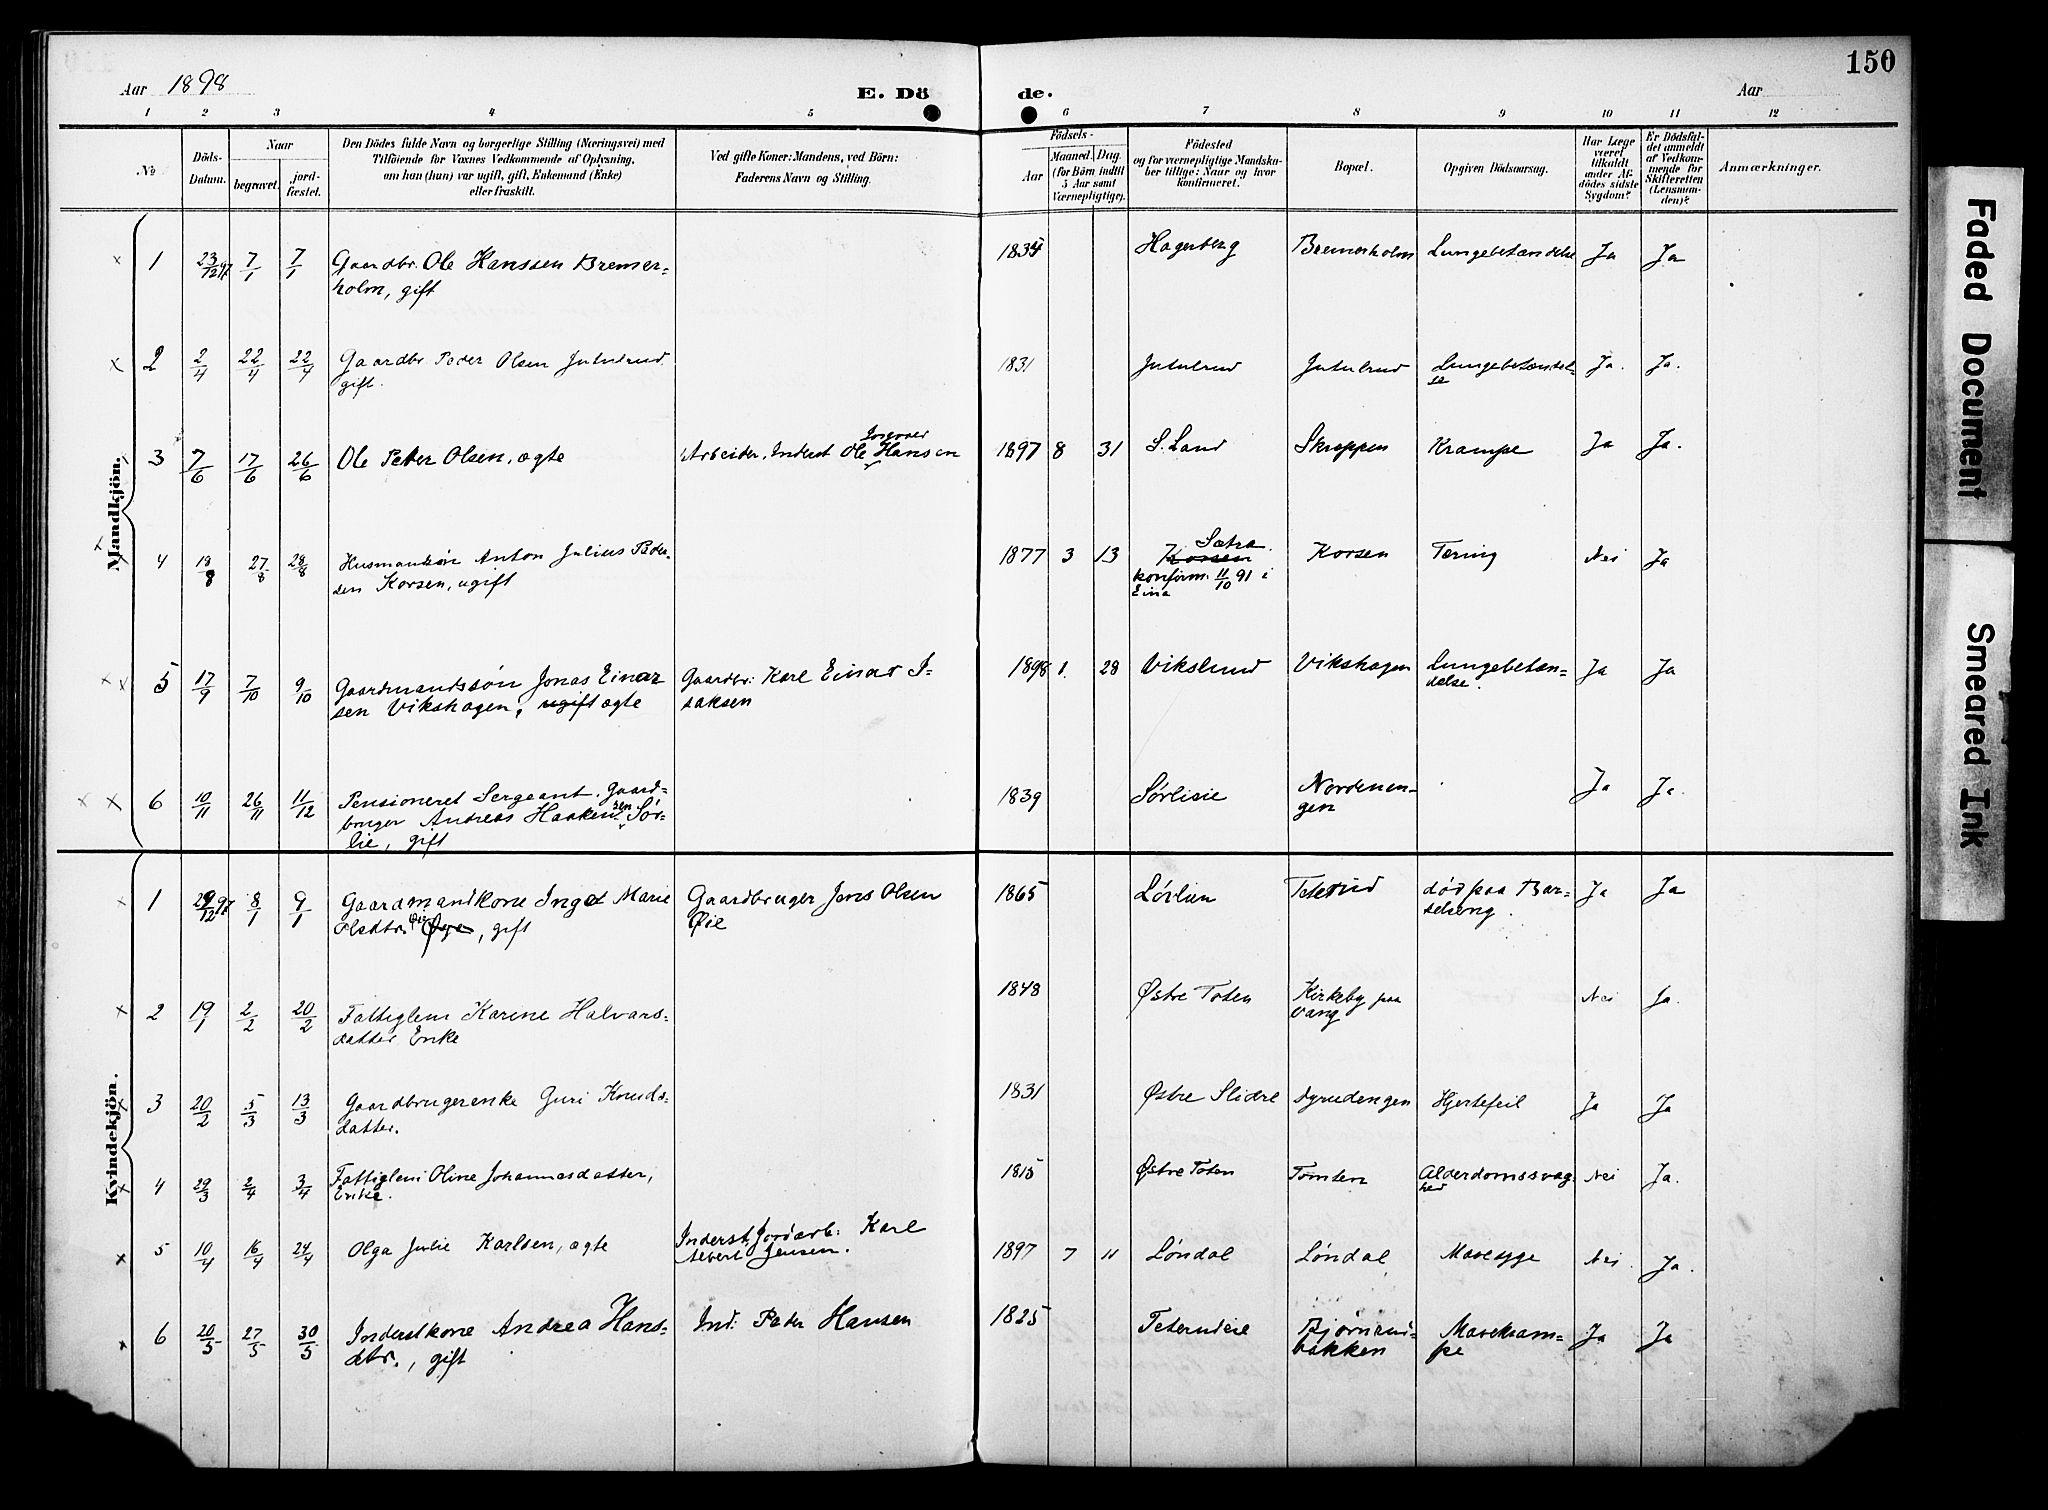 SAH, Vestre Toten prestekontor, H/Ha/Haa/L0012: Ministerialbok nr. 12, 1890-1906, s. 150